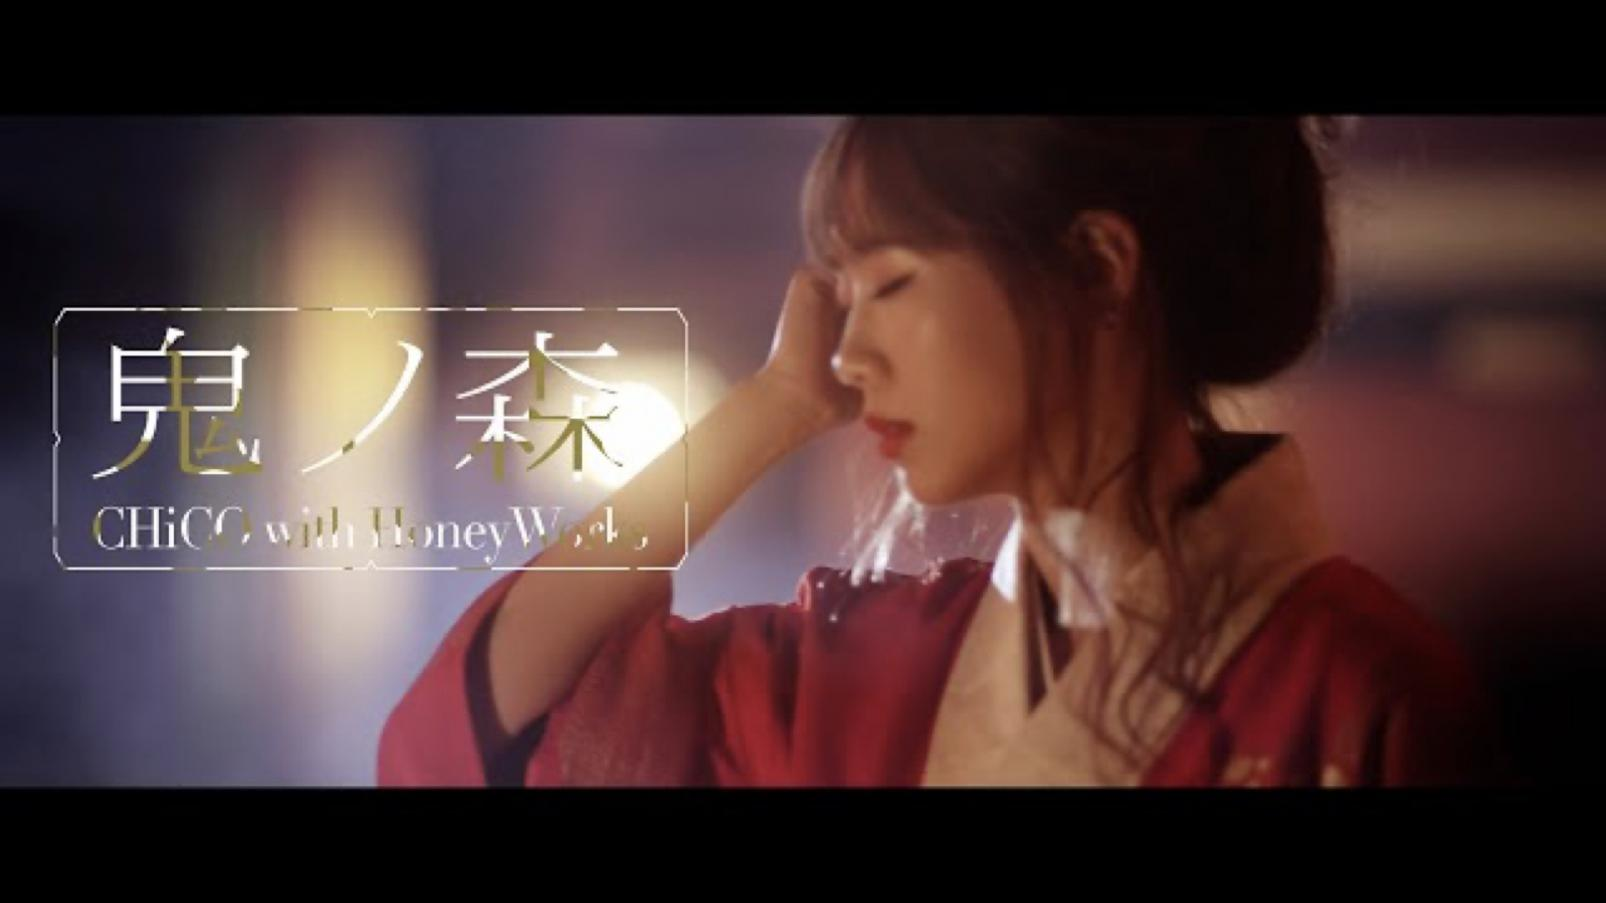 CHiCO with HoneyWorks 13thシングル『鬼ノ森』 – 映画『樹海村』-1